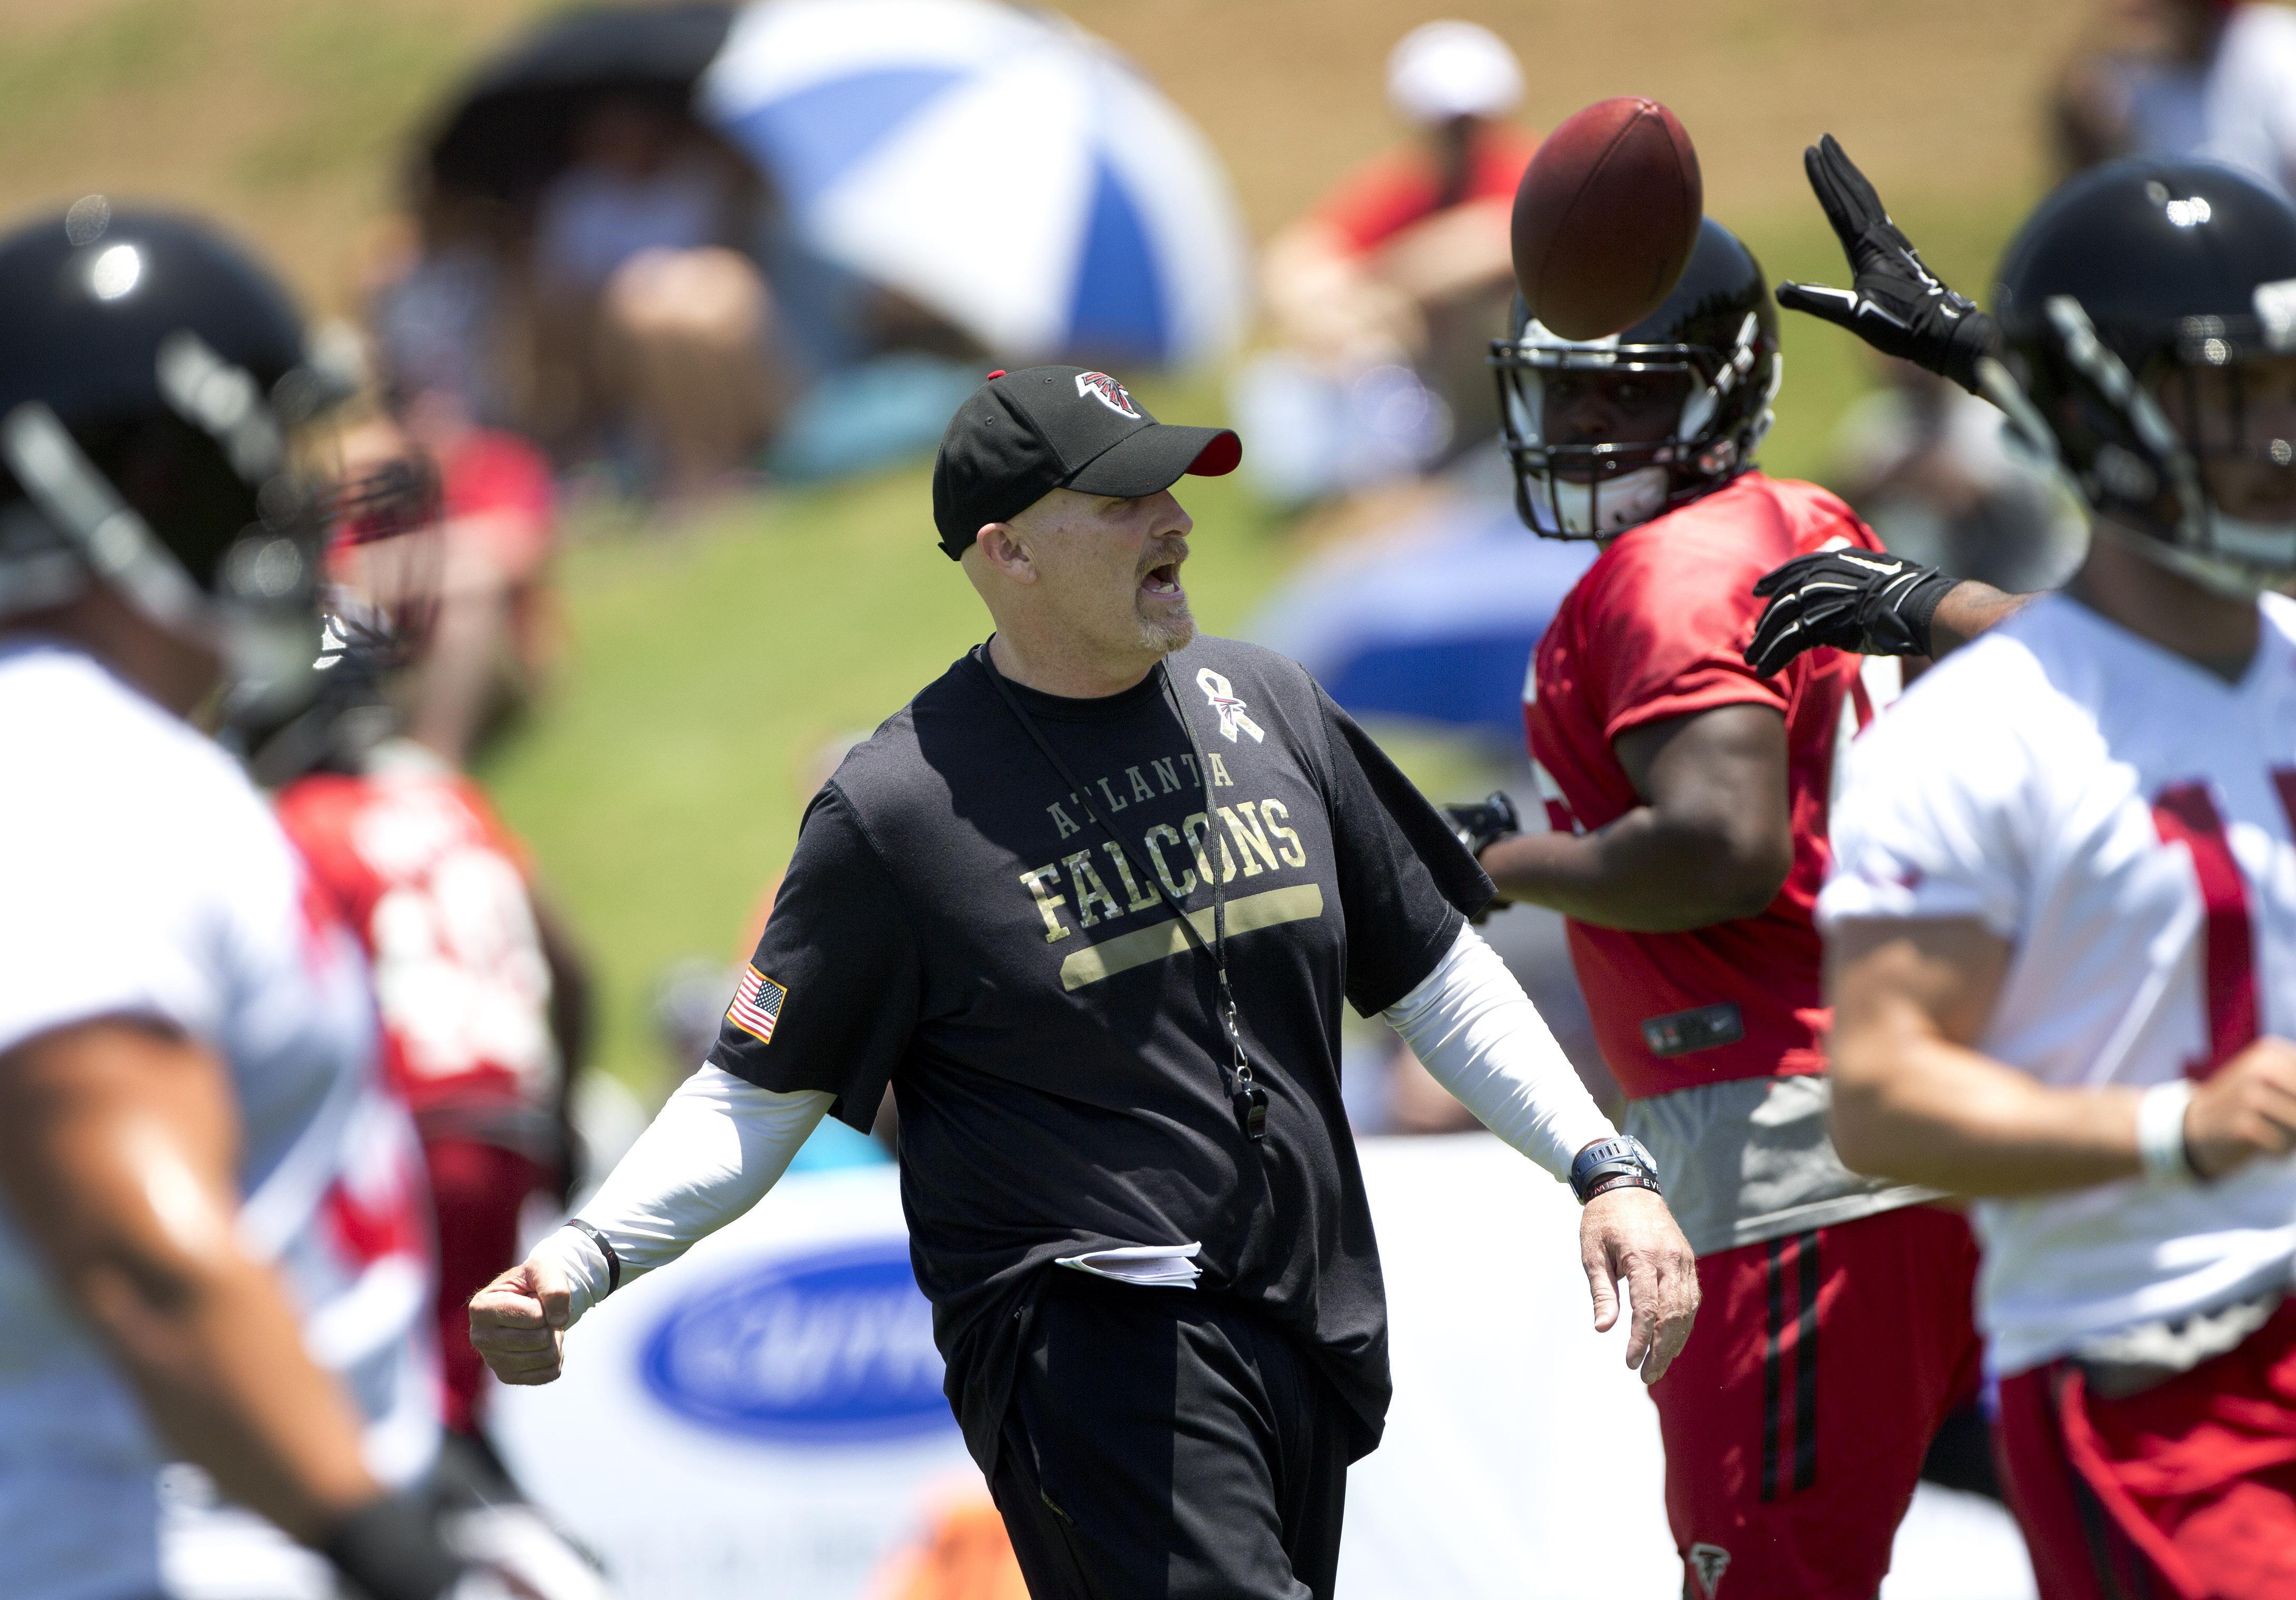 Atlanta Falcons head coach Dan Quinn directs his players during NFL football minicamp, Tuesday, June 16, 2015, in Flowery Branch, Ga. (AP Photo/John Bazemore)